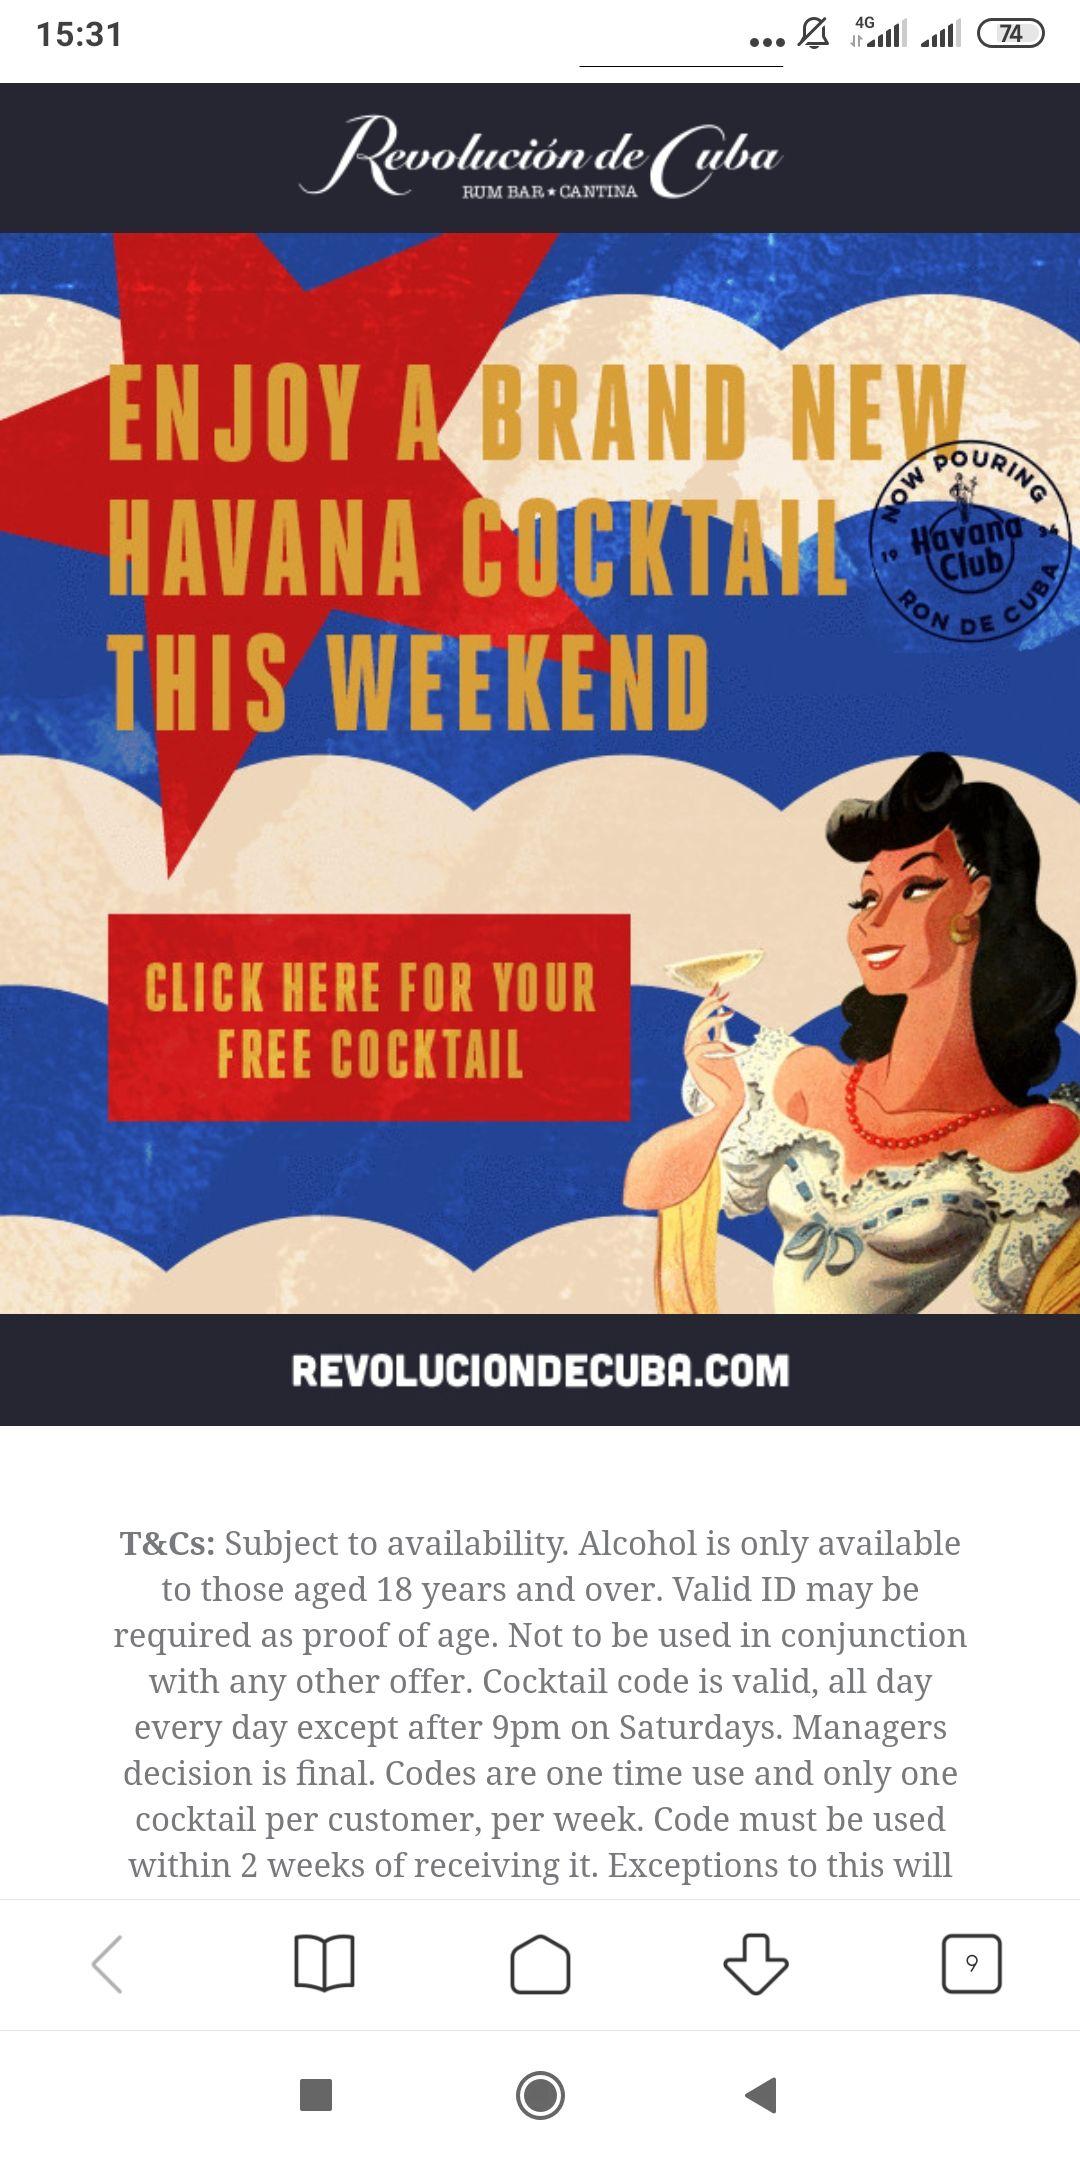 Free cocktail at Revolution de Cuba